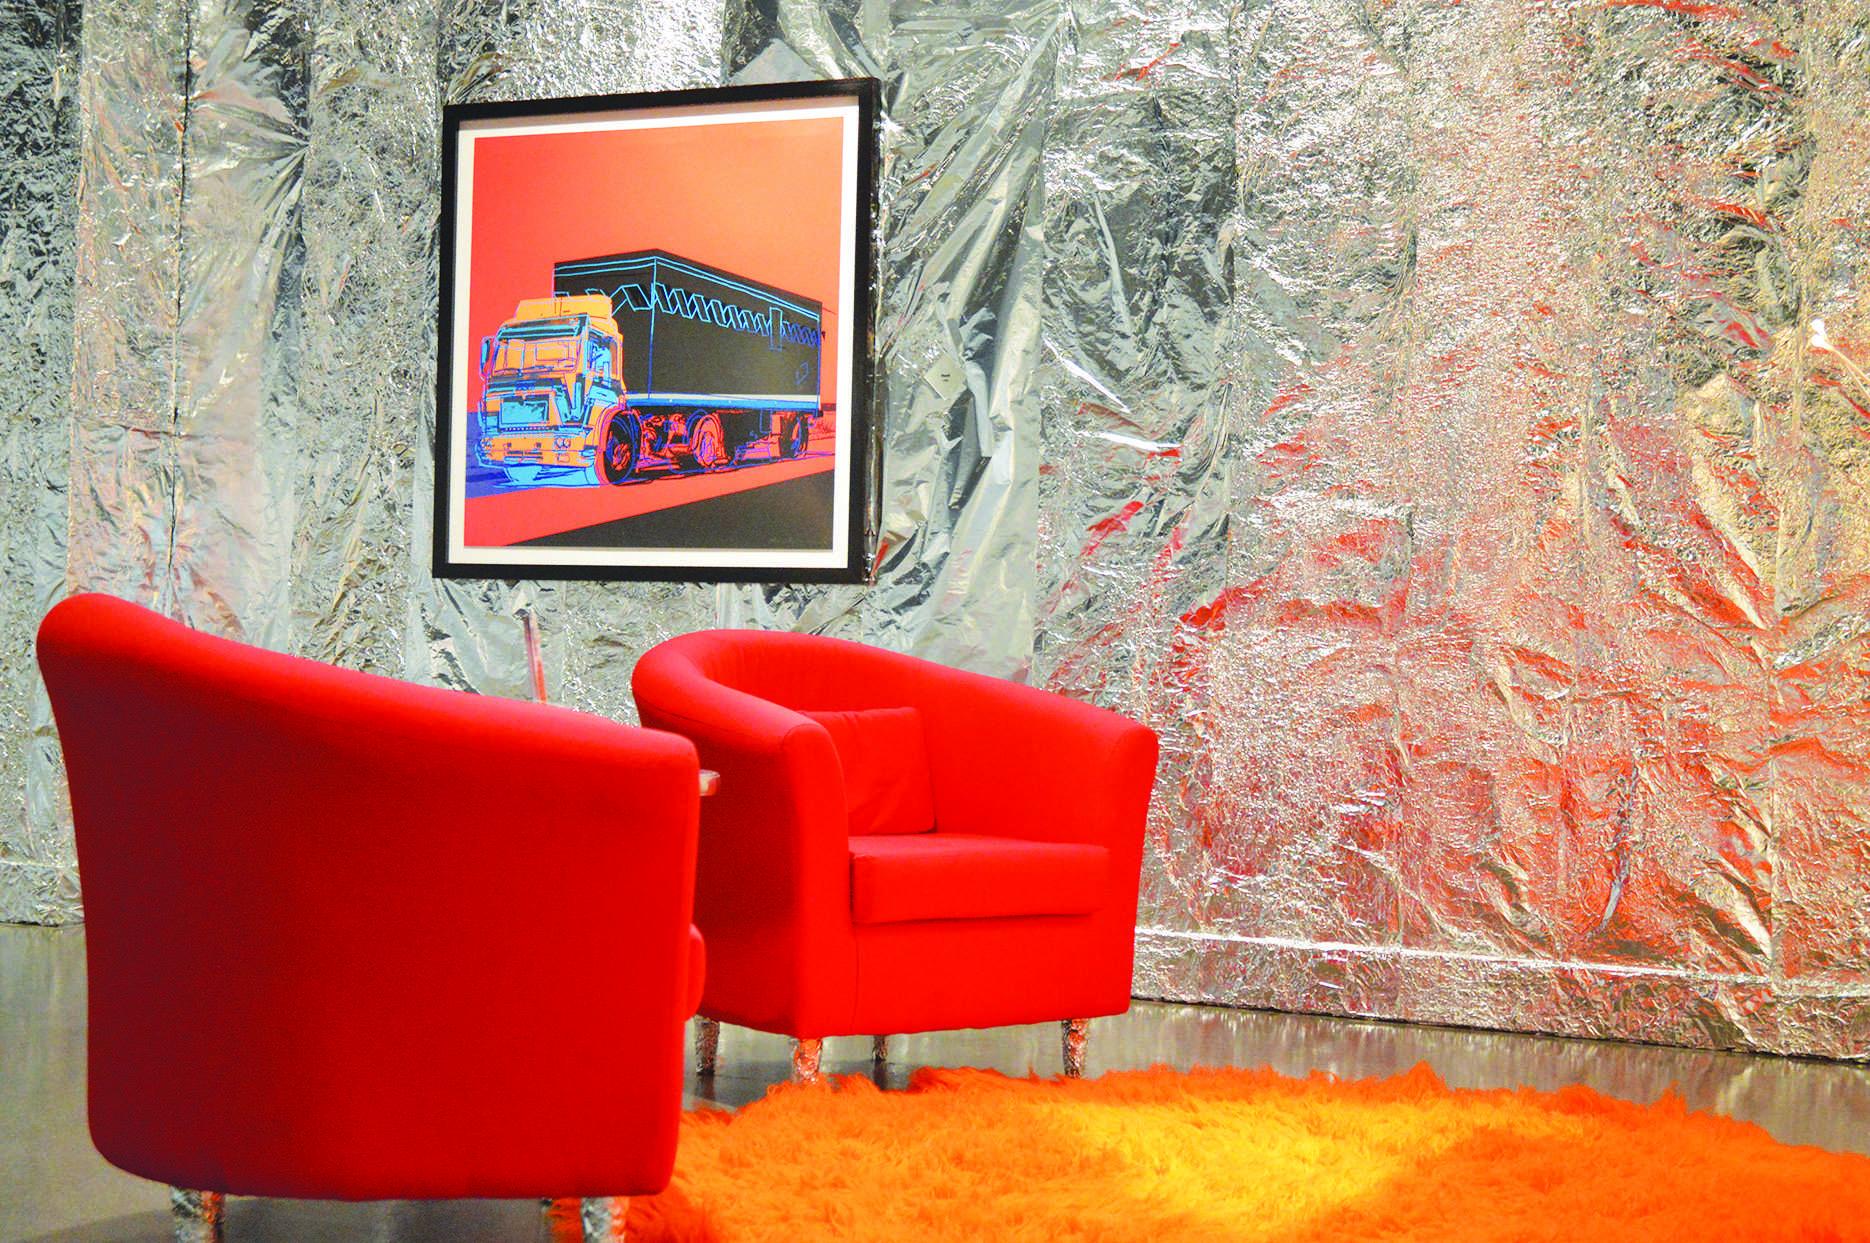 Turchin mimics 'Silver Factory' with Warhol display